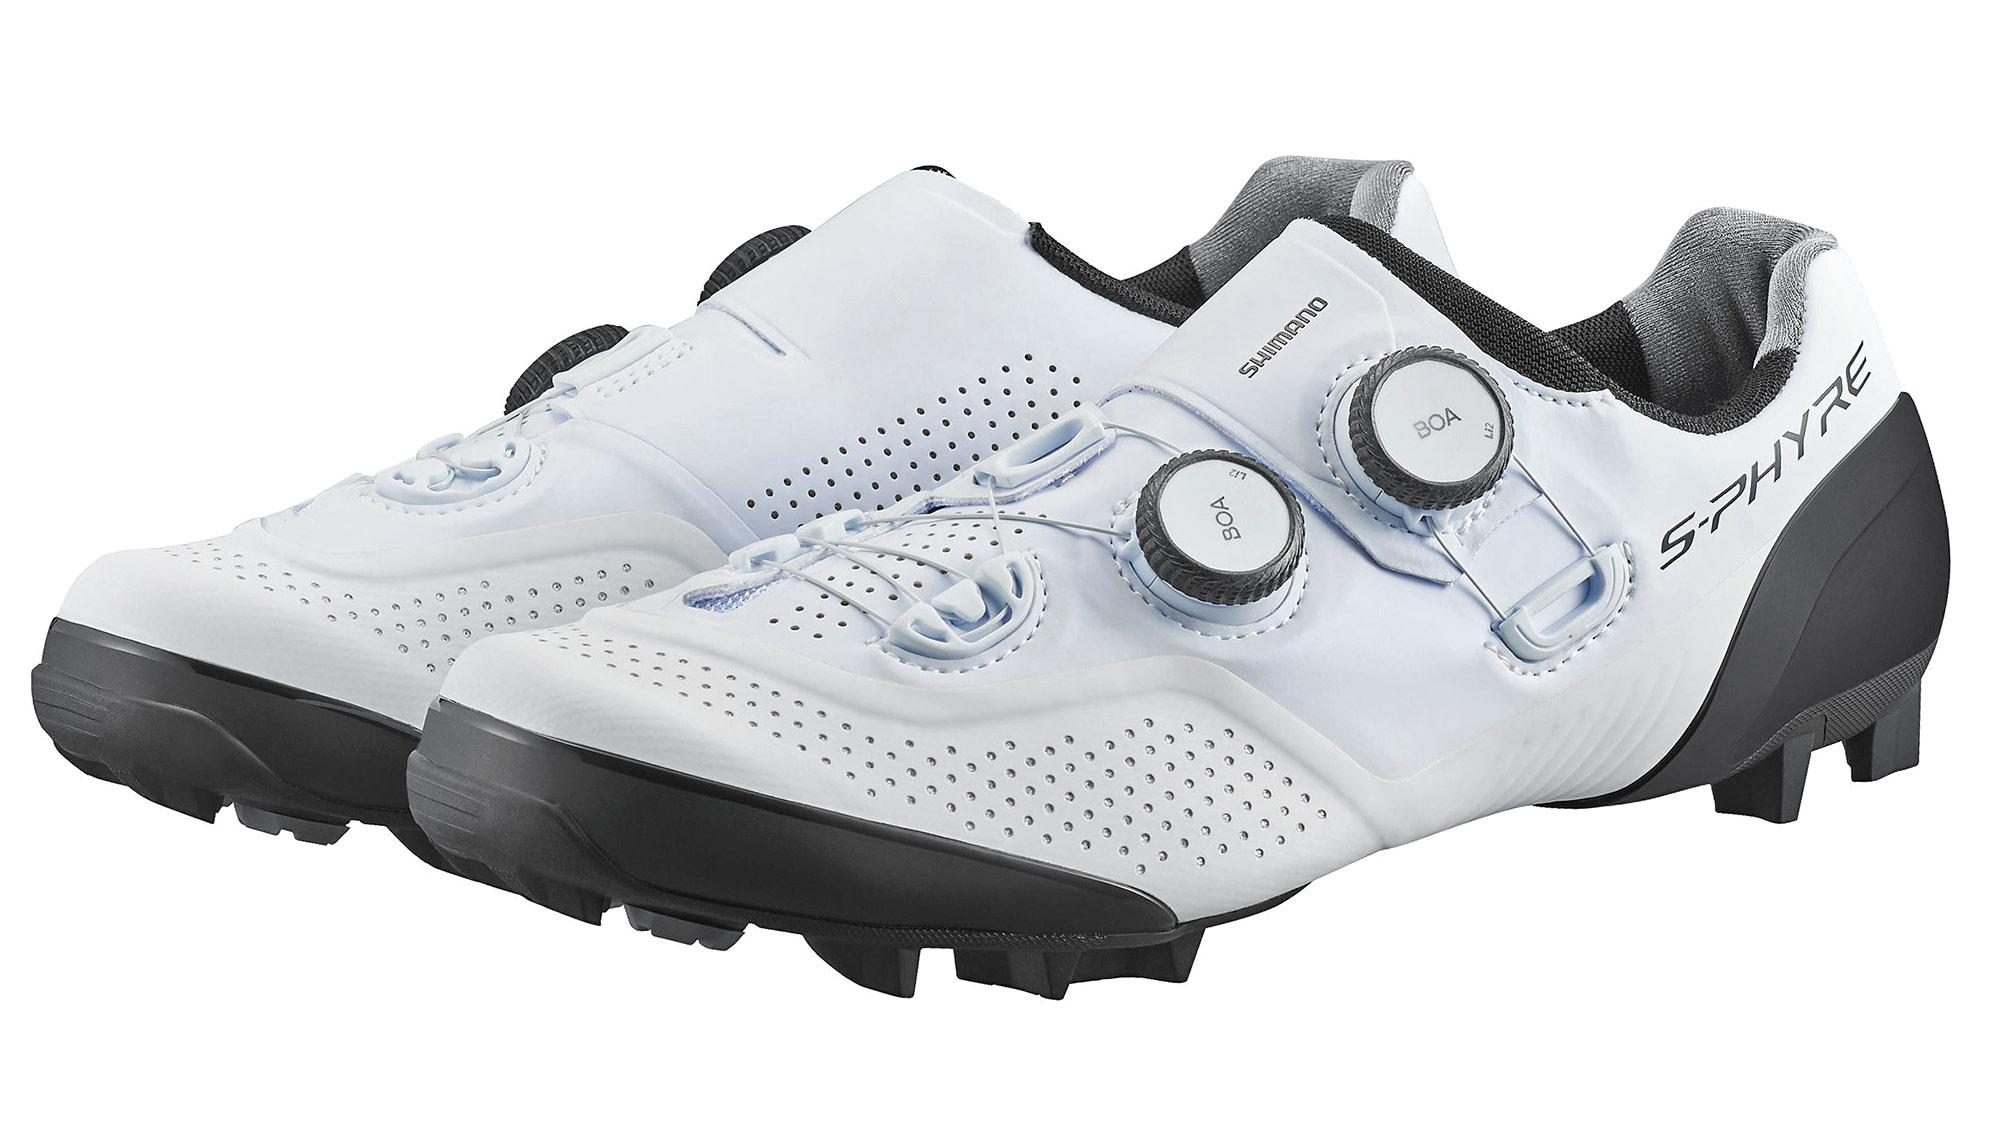 Shimano S-Phyre XC902 MTB shoes, next-gen XC9 cross-country mountain bike shoe,white pair